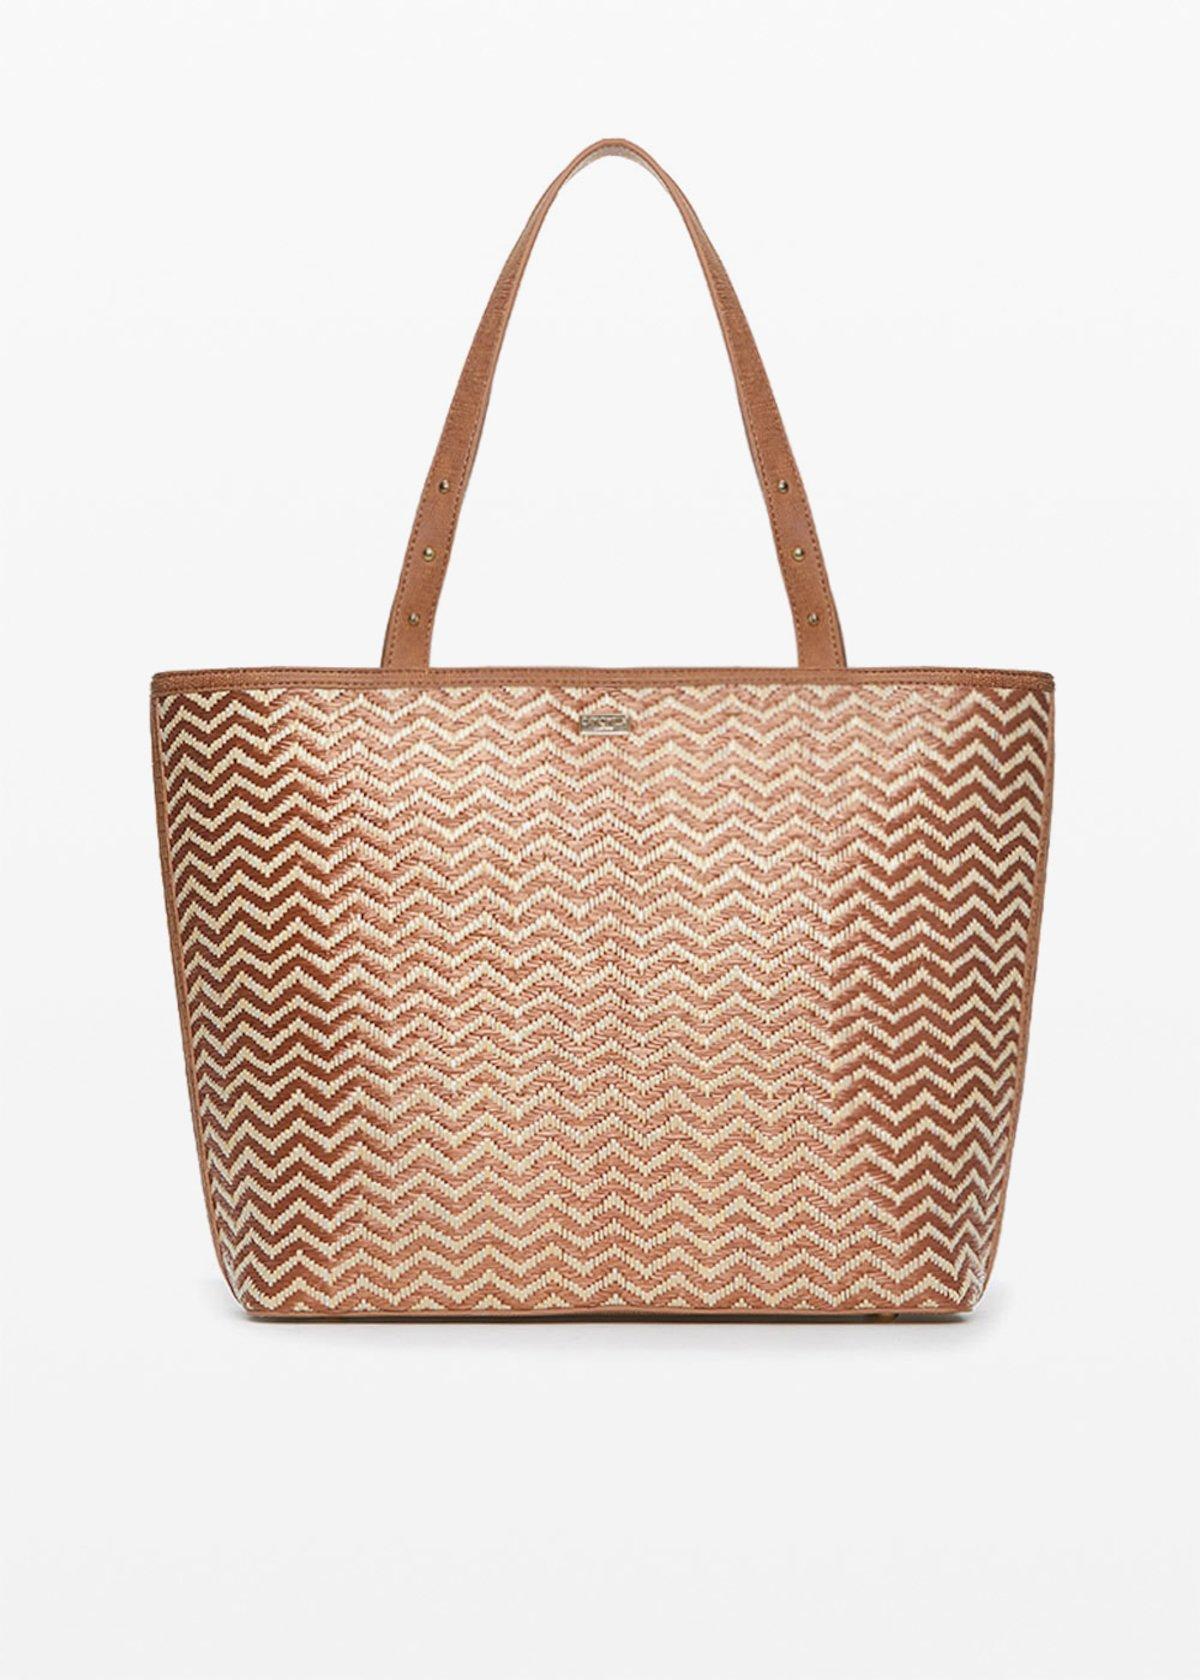 Faux leather and straw Brigitte shopping bag zigzag design - Lion / Safari - Woman